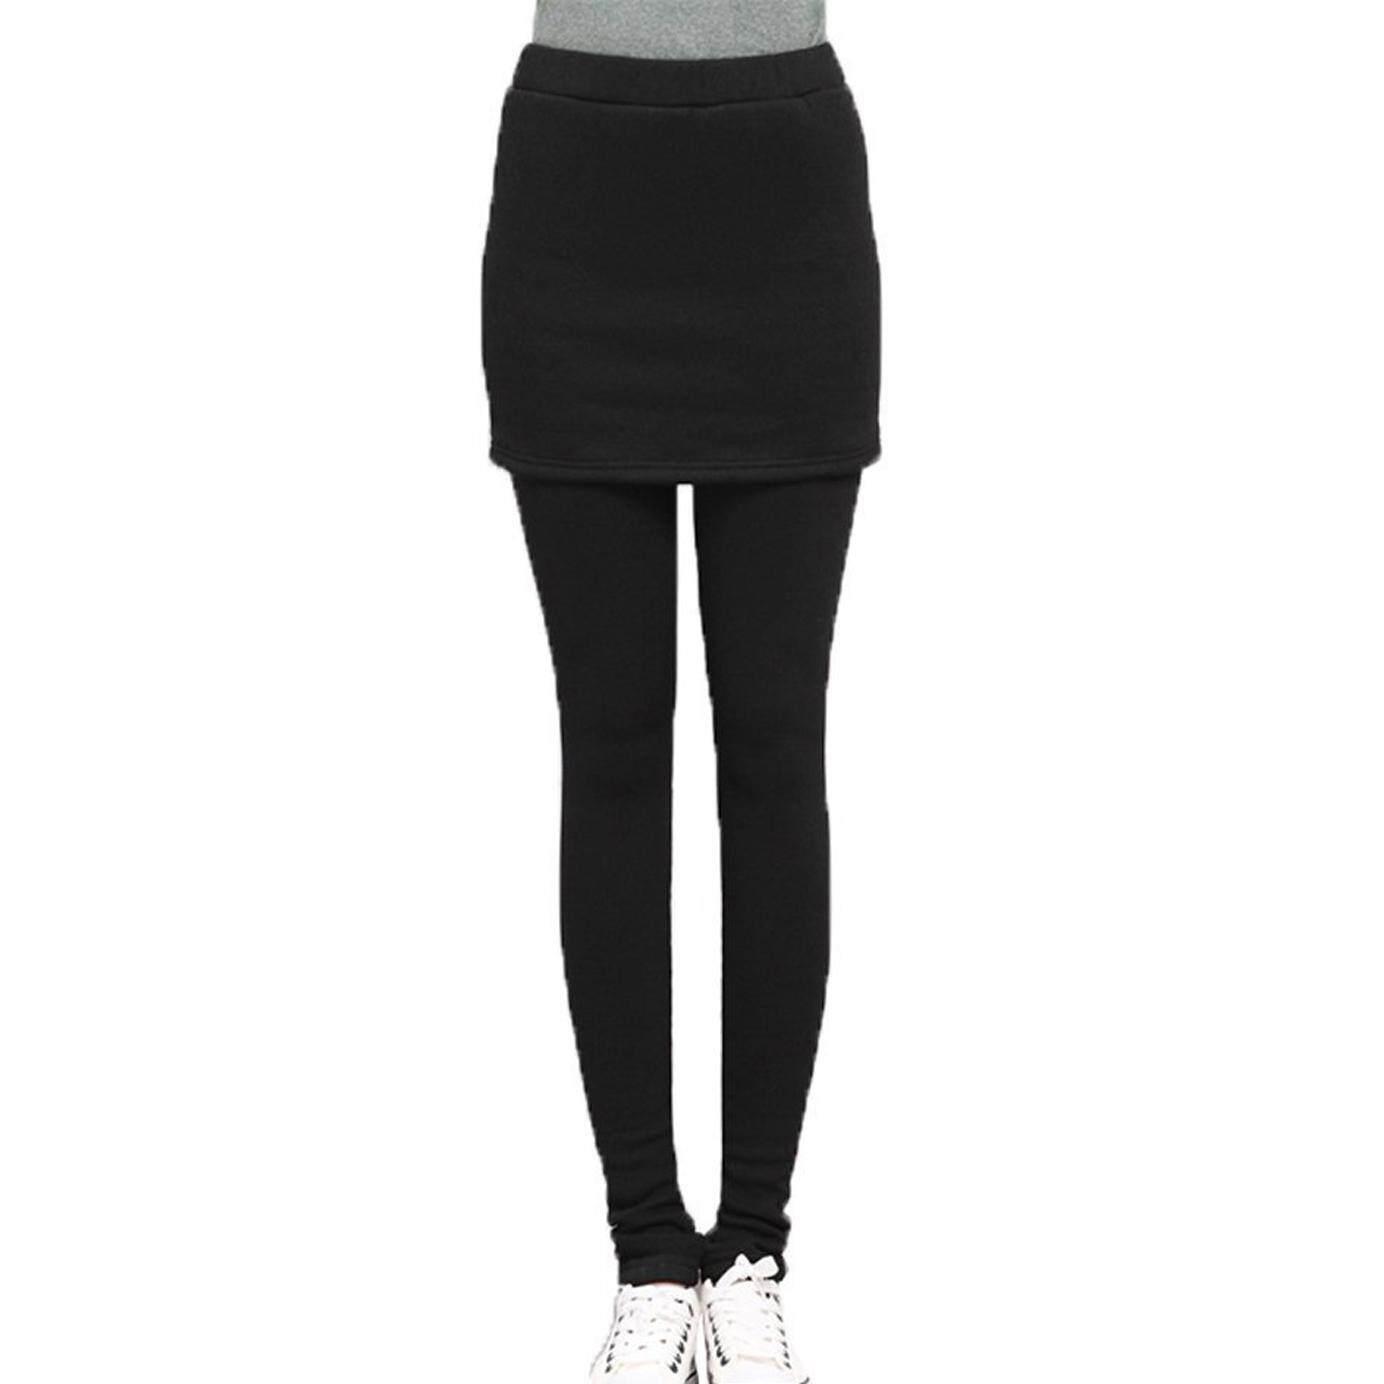 2a8bf87e712 Hot Women Autumn Winter Skirt Leggings Cotton Pleated Tights Stretch  Pants-black - intl